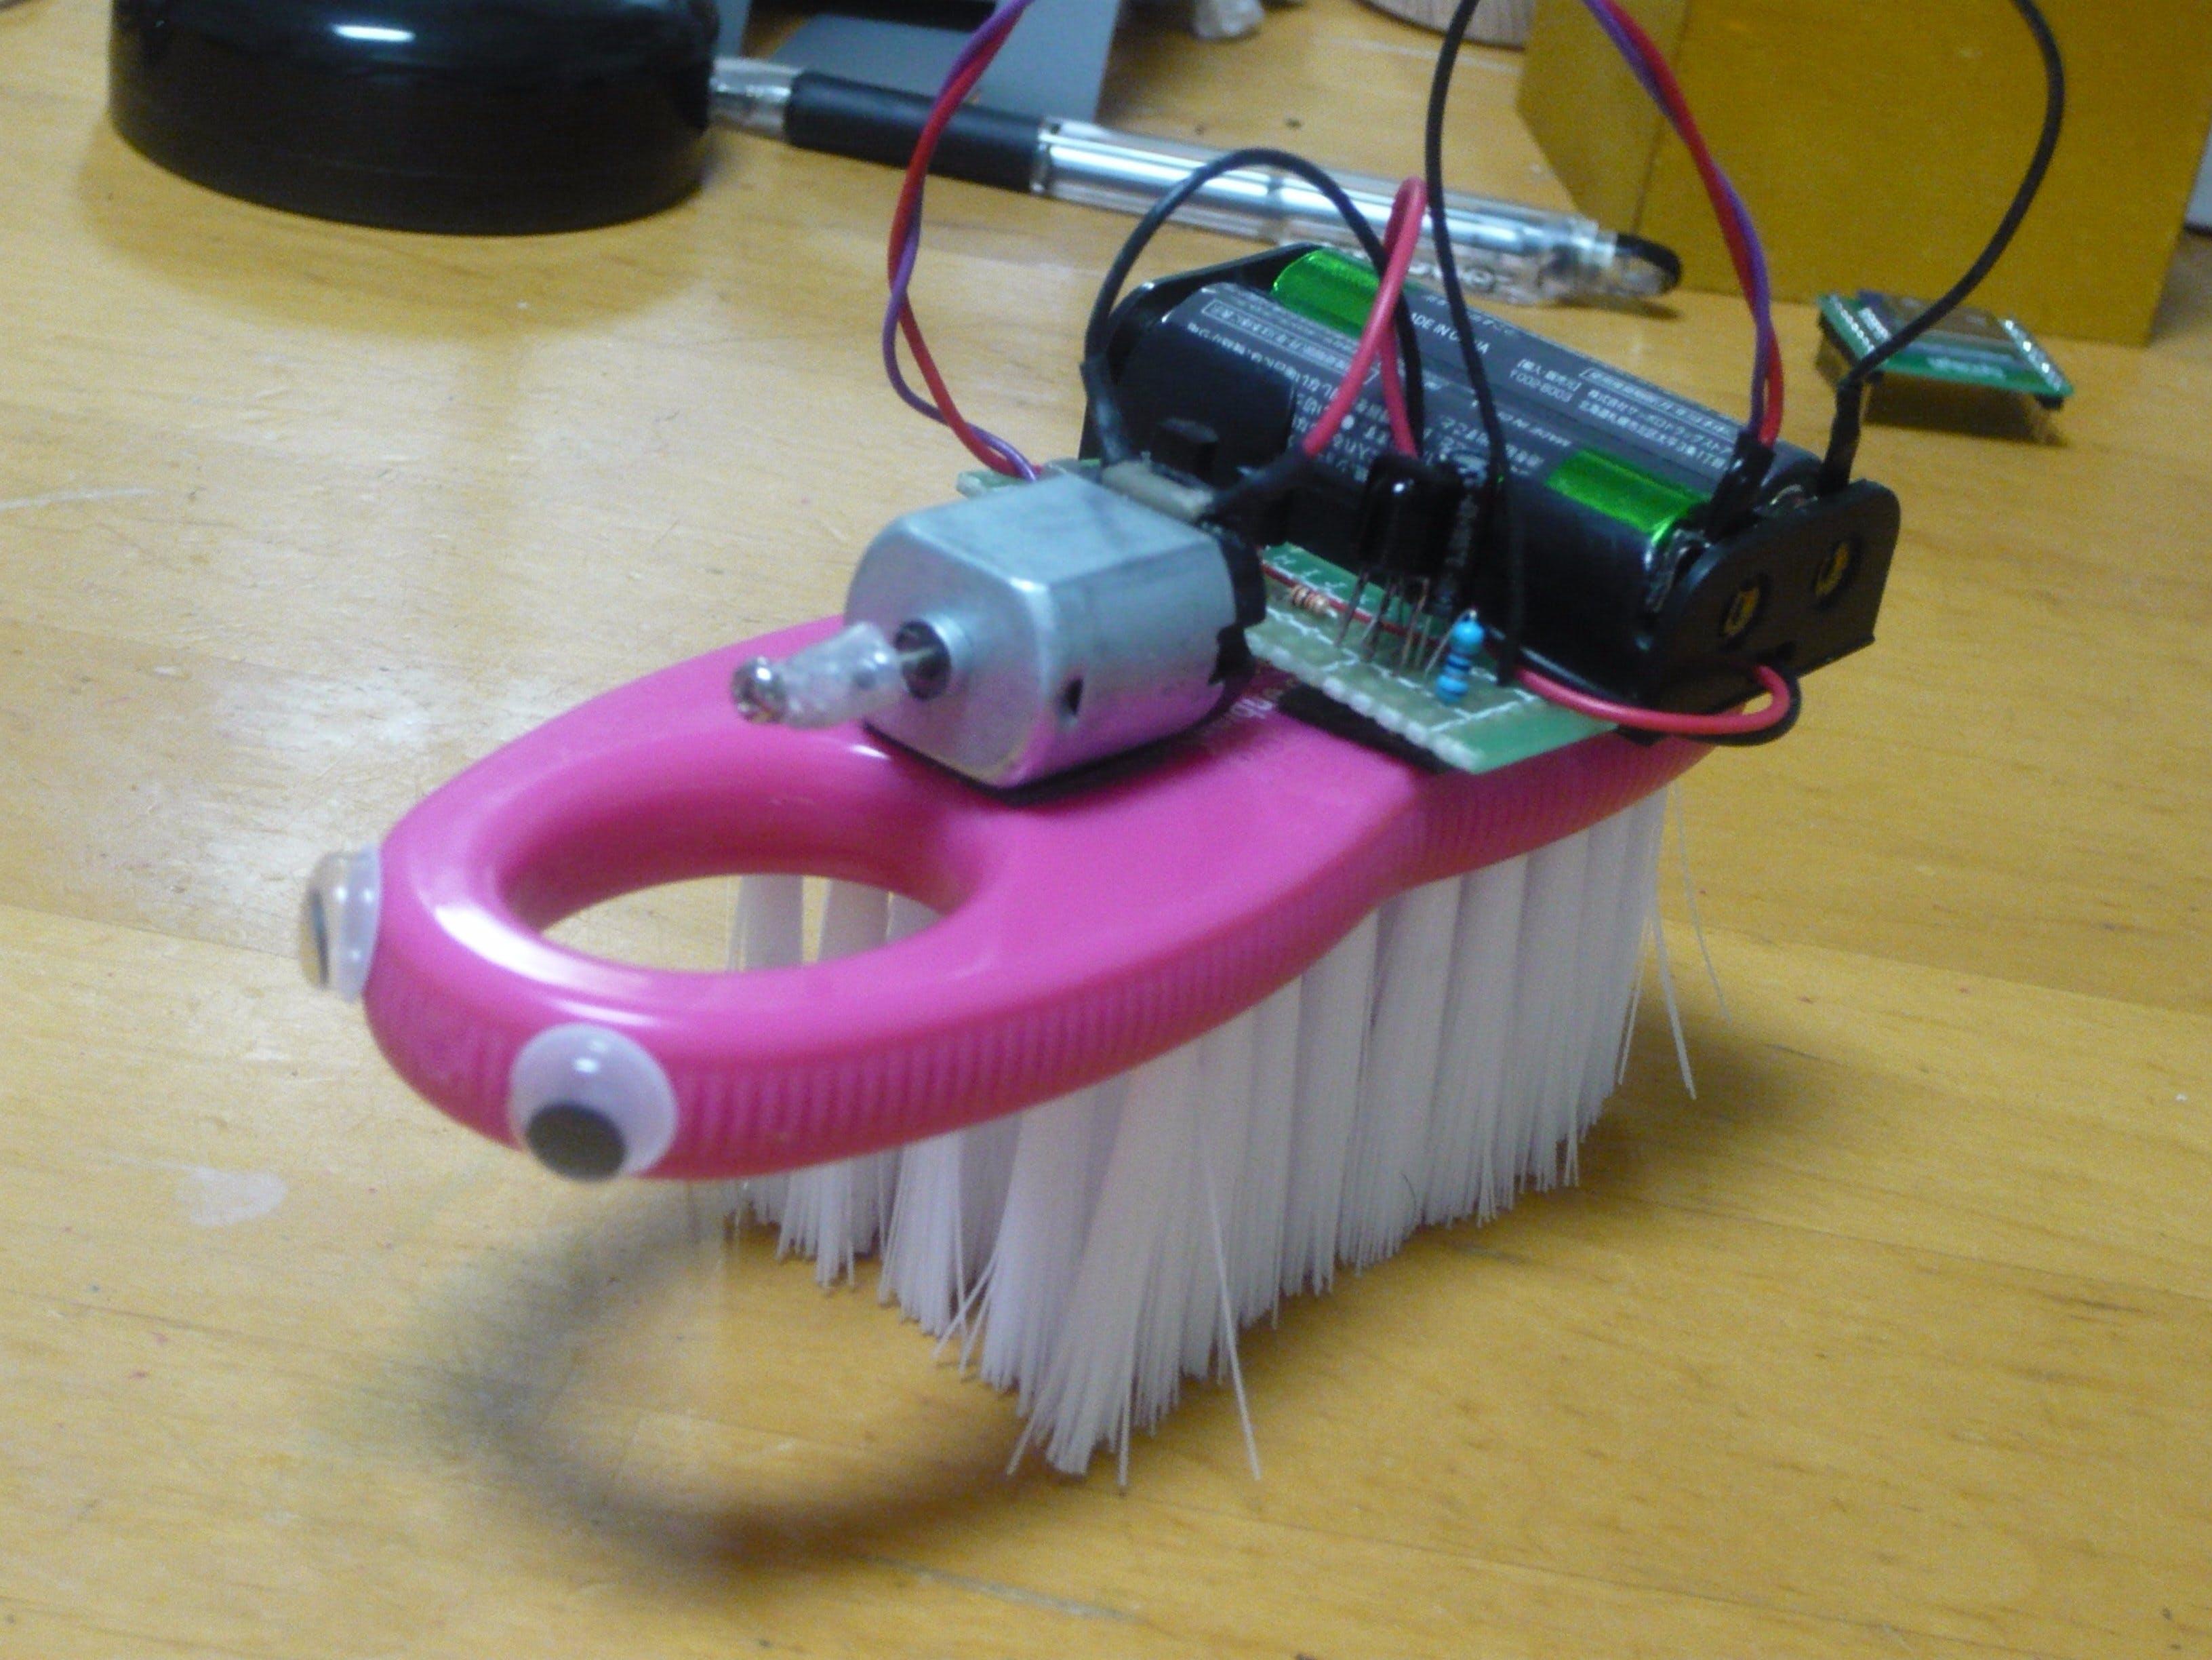 IR Controlled Brush!